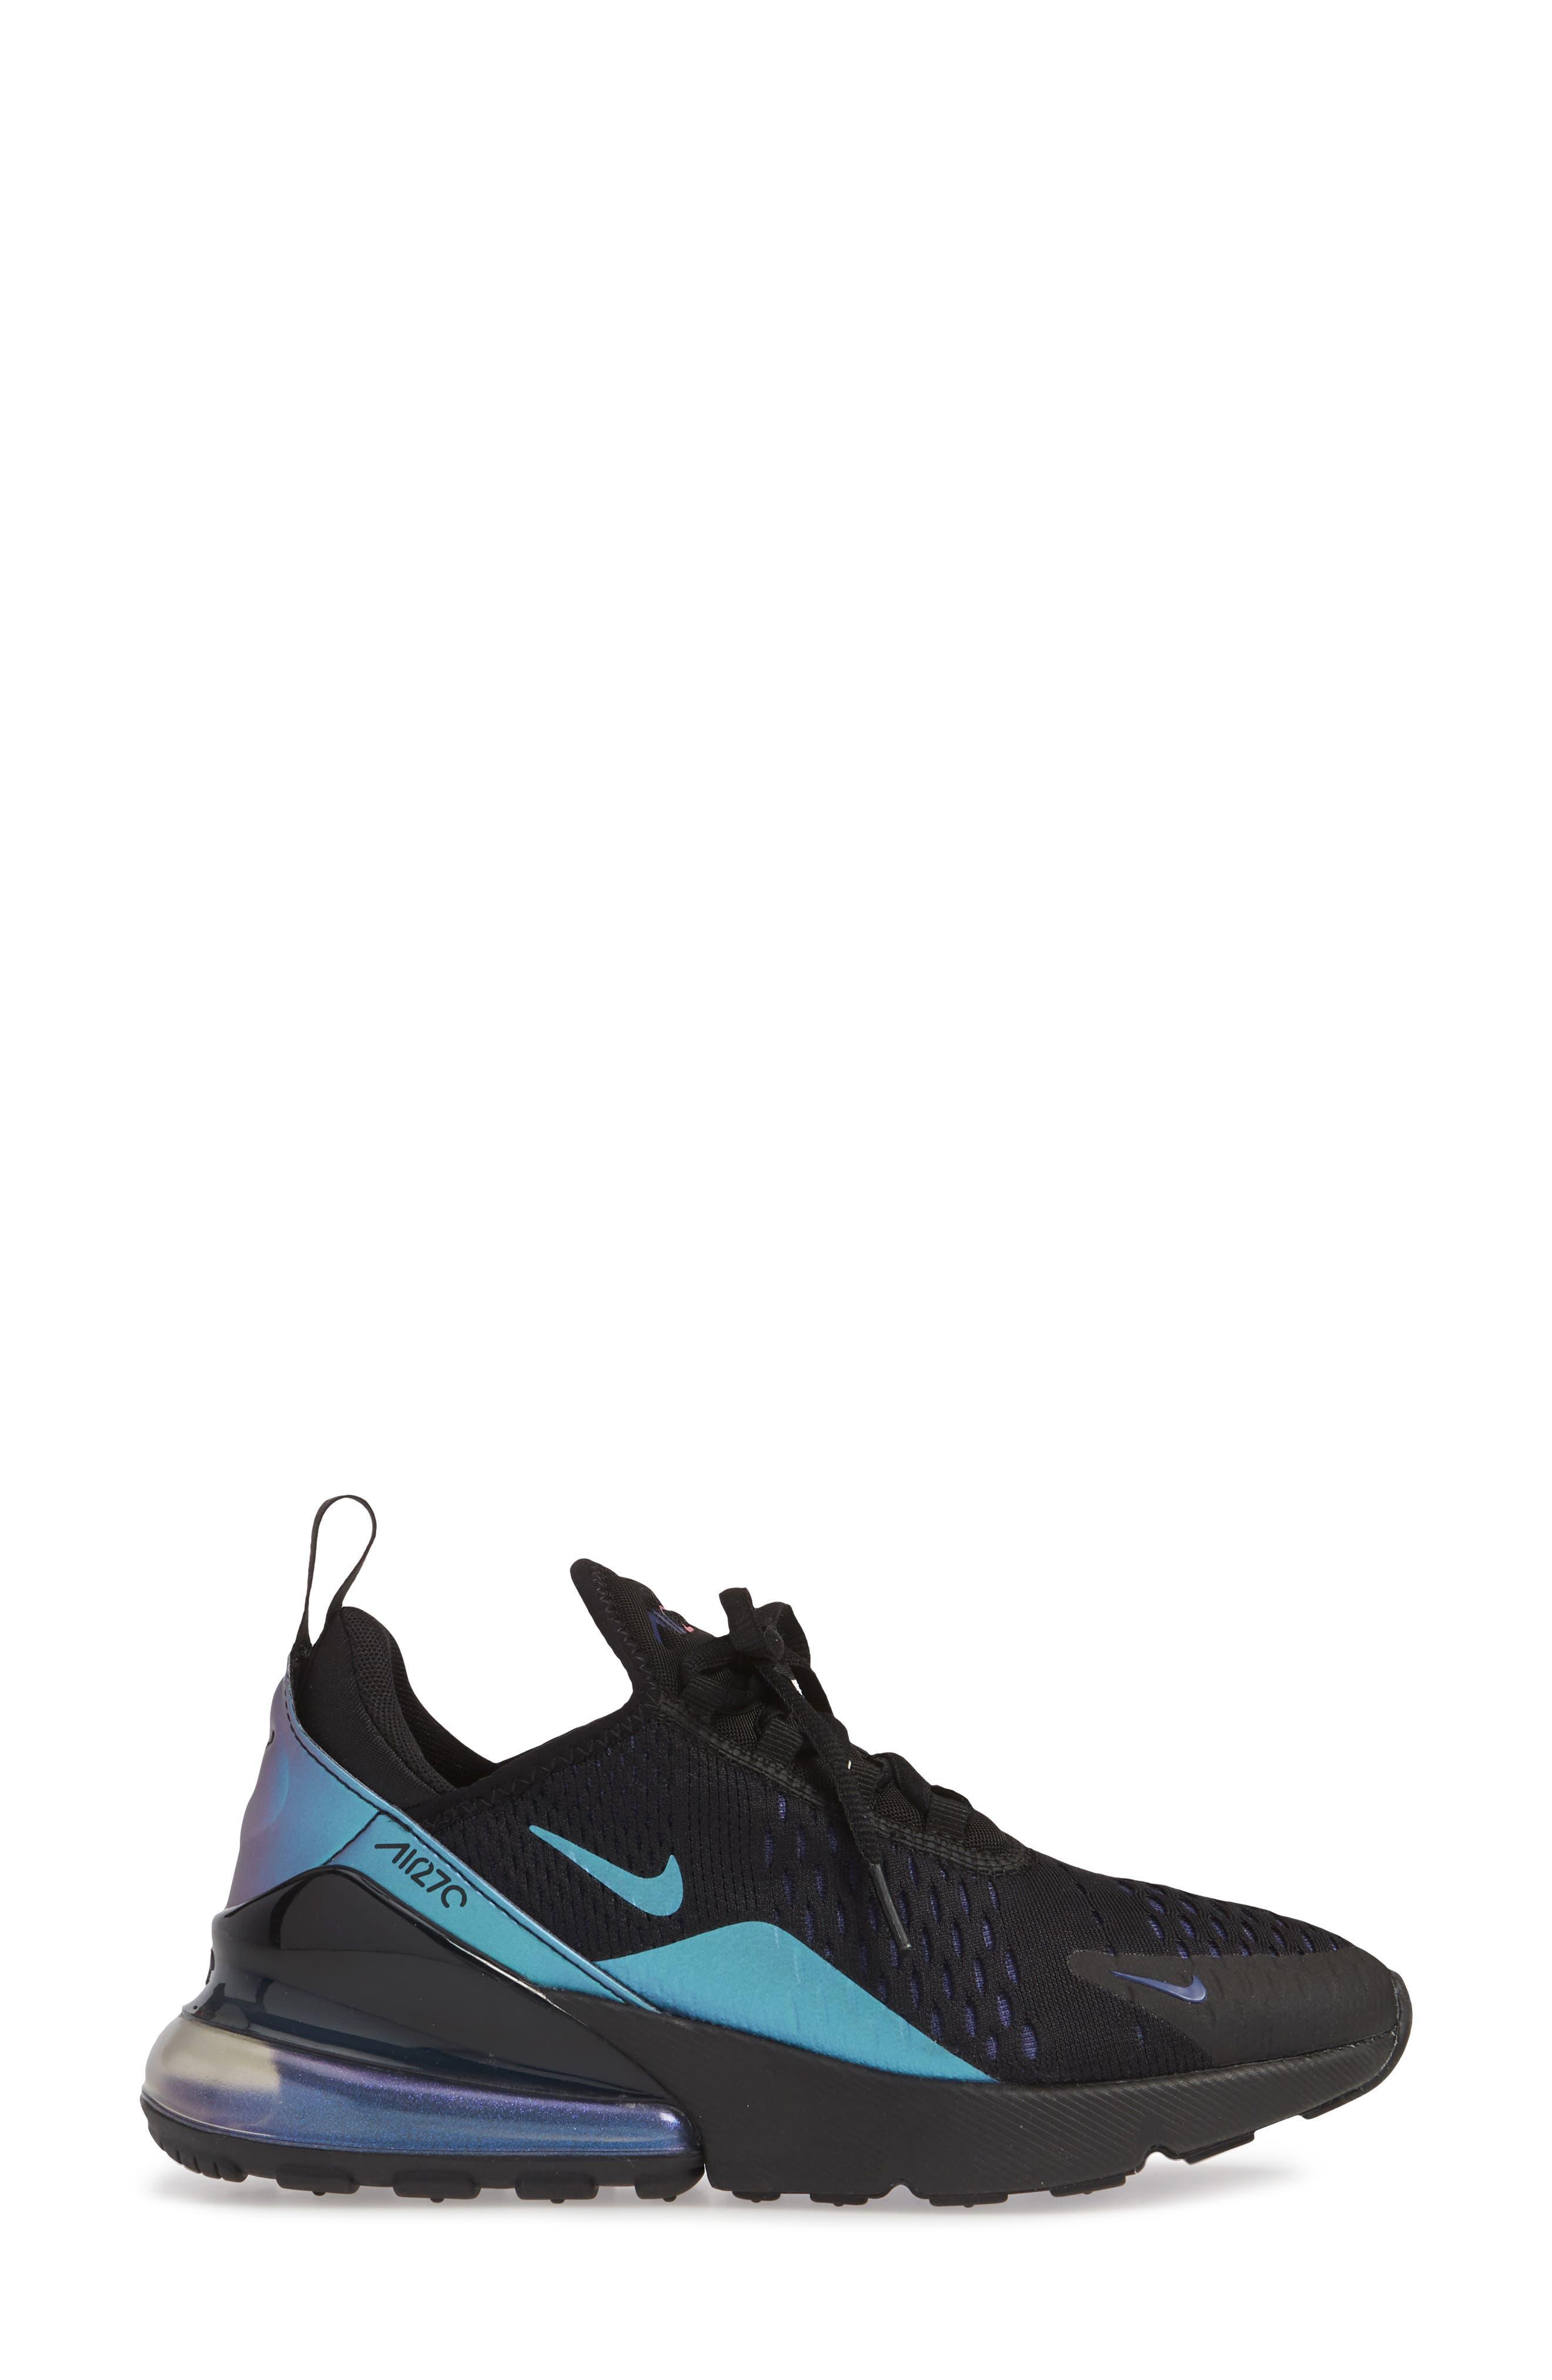 NIKE,                             Air Max 270 Premium Sneaker,                             Alternate thumbnail 3, color,                             BLACK/ FUCHSIA/ PURPLE